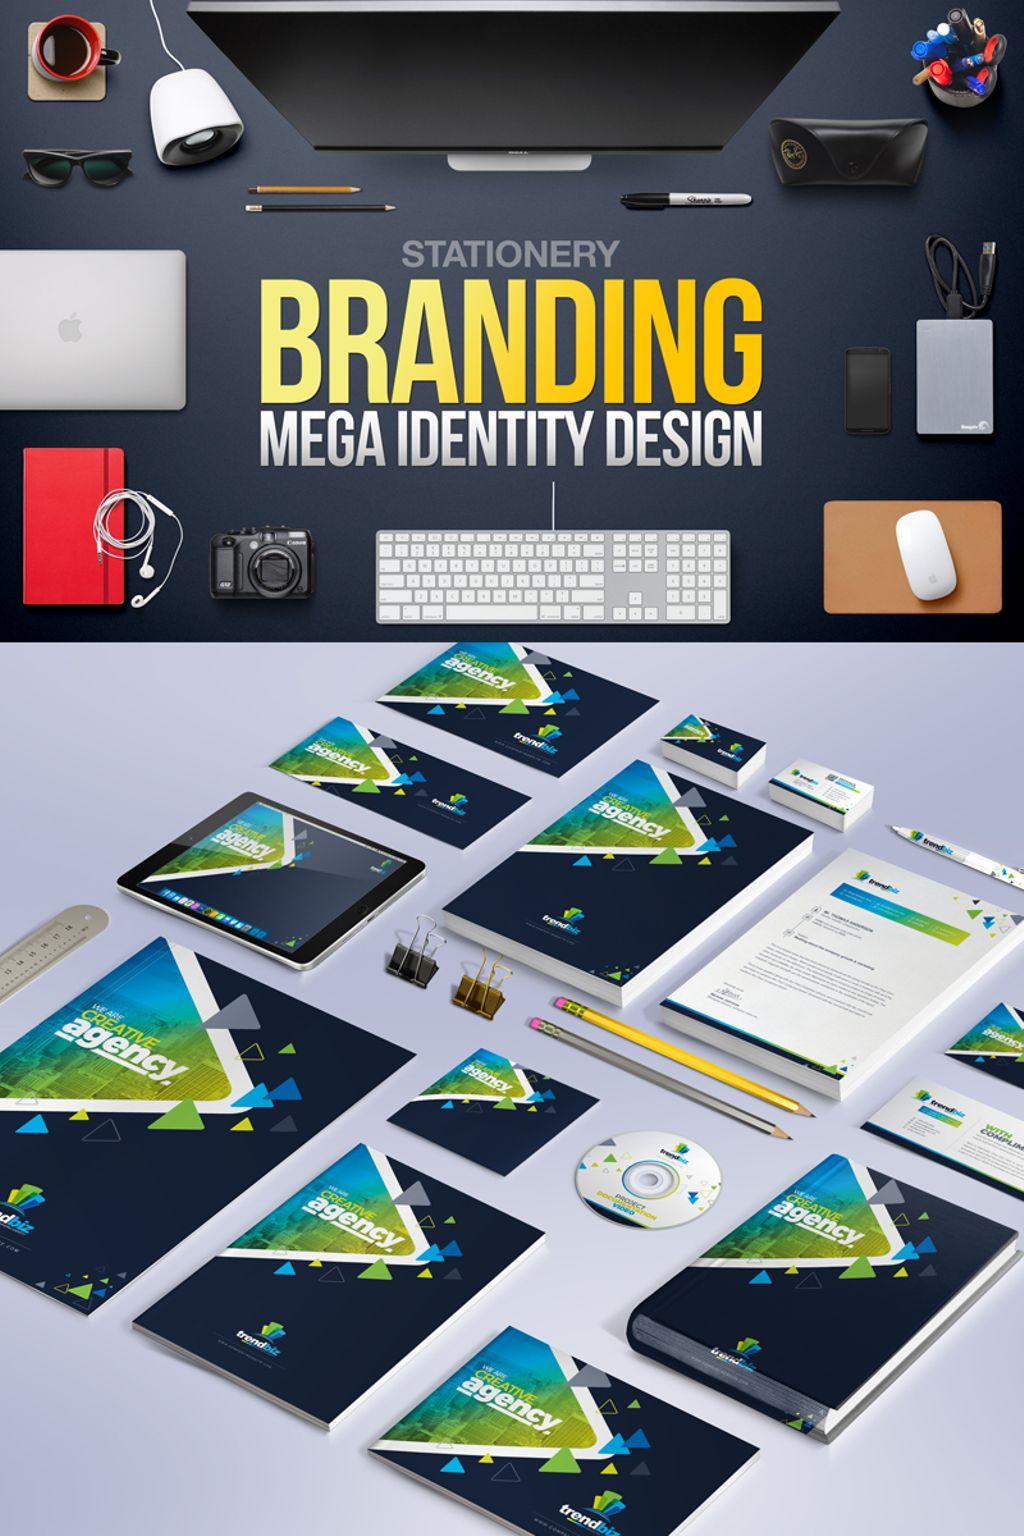 Stationery Branding Mega Identity Design Template de Identidade Corporativa №67294